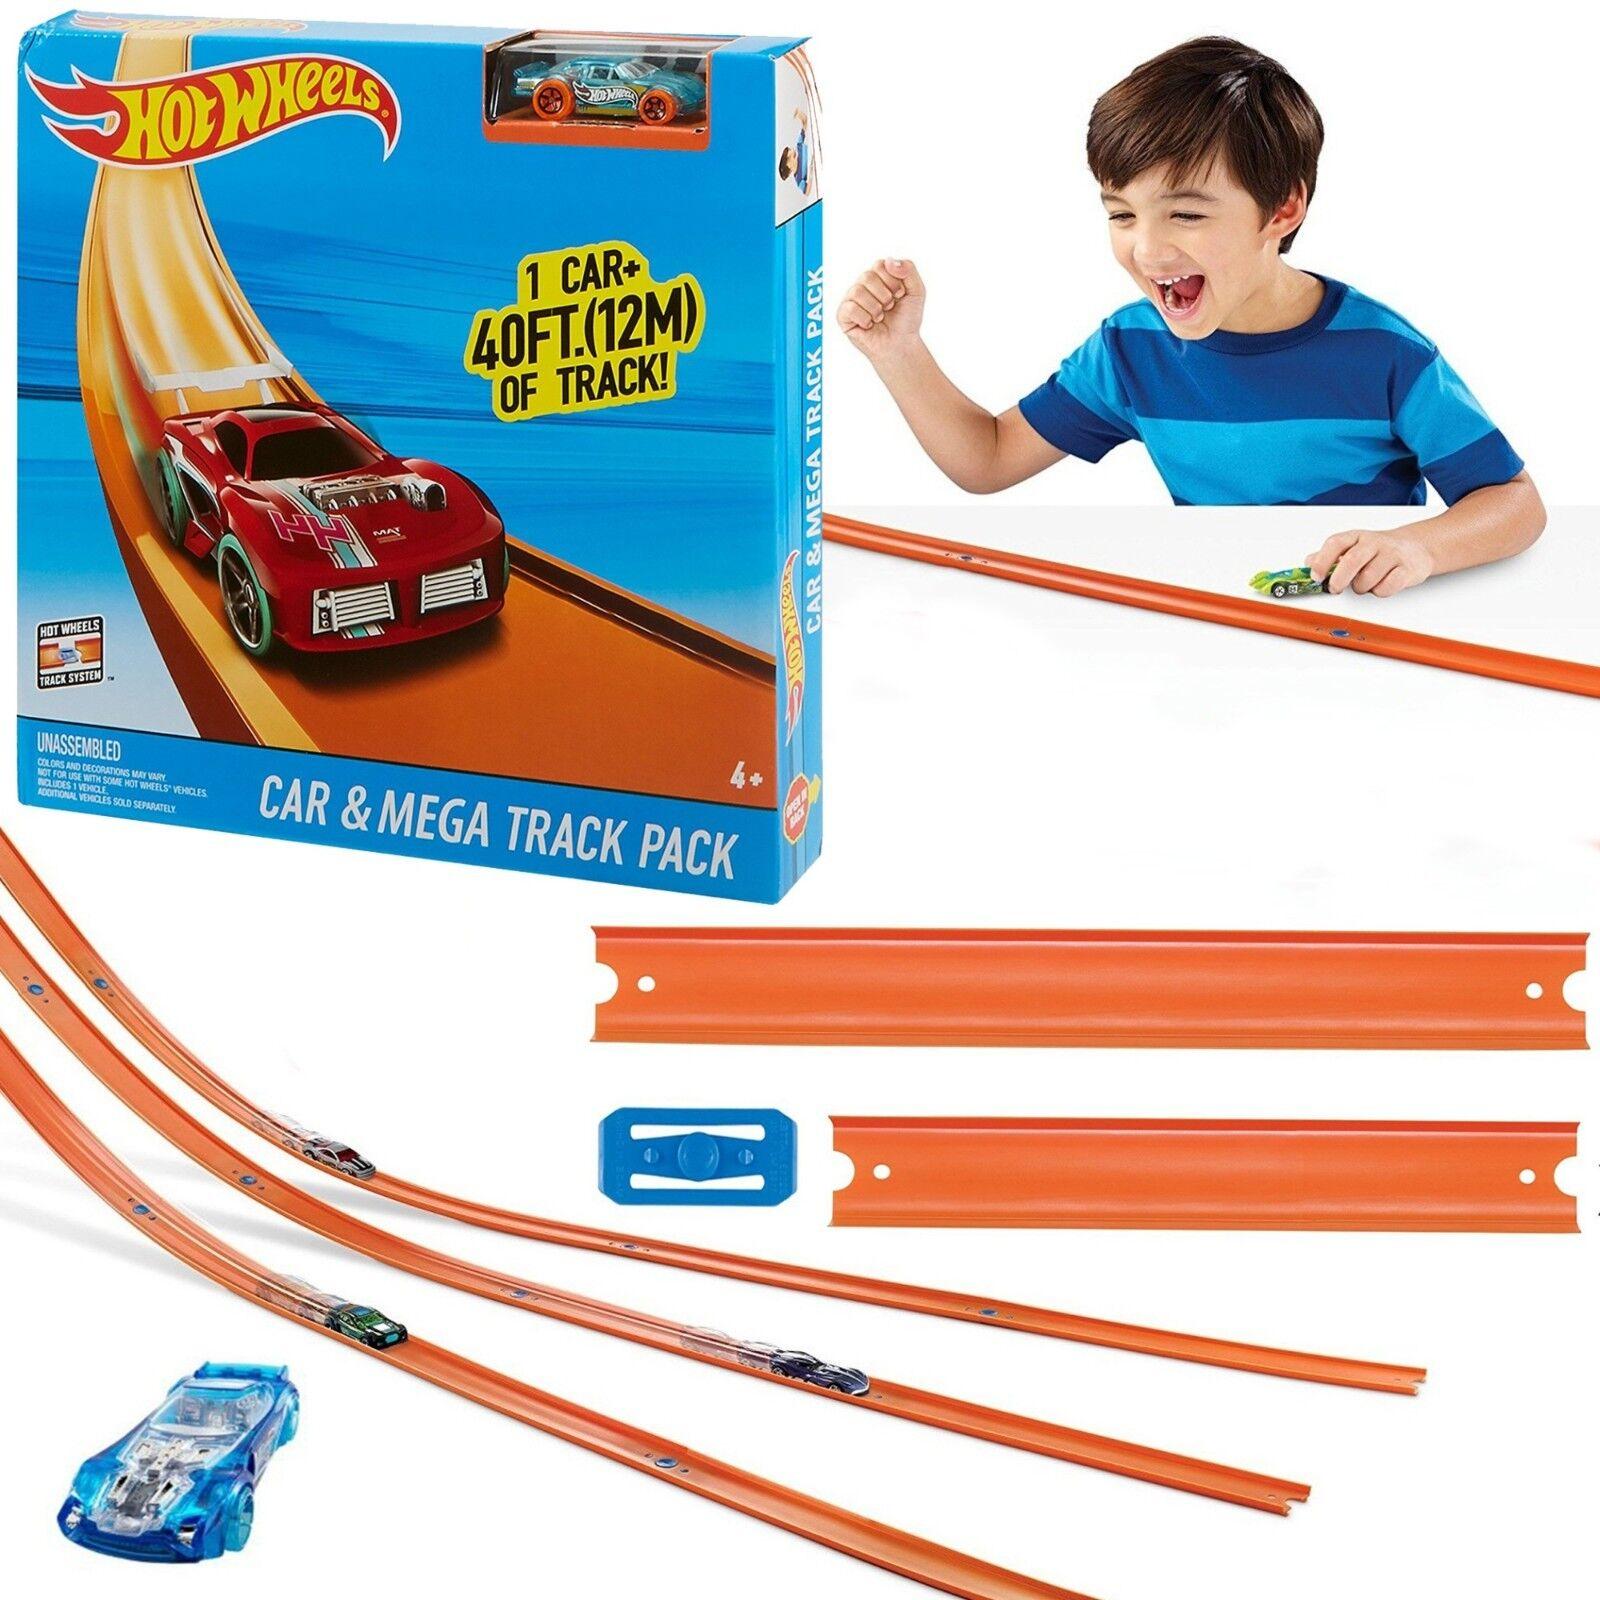 HOT WHEELS® CAR & MEGA TRACK PACK